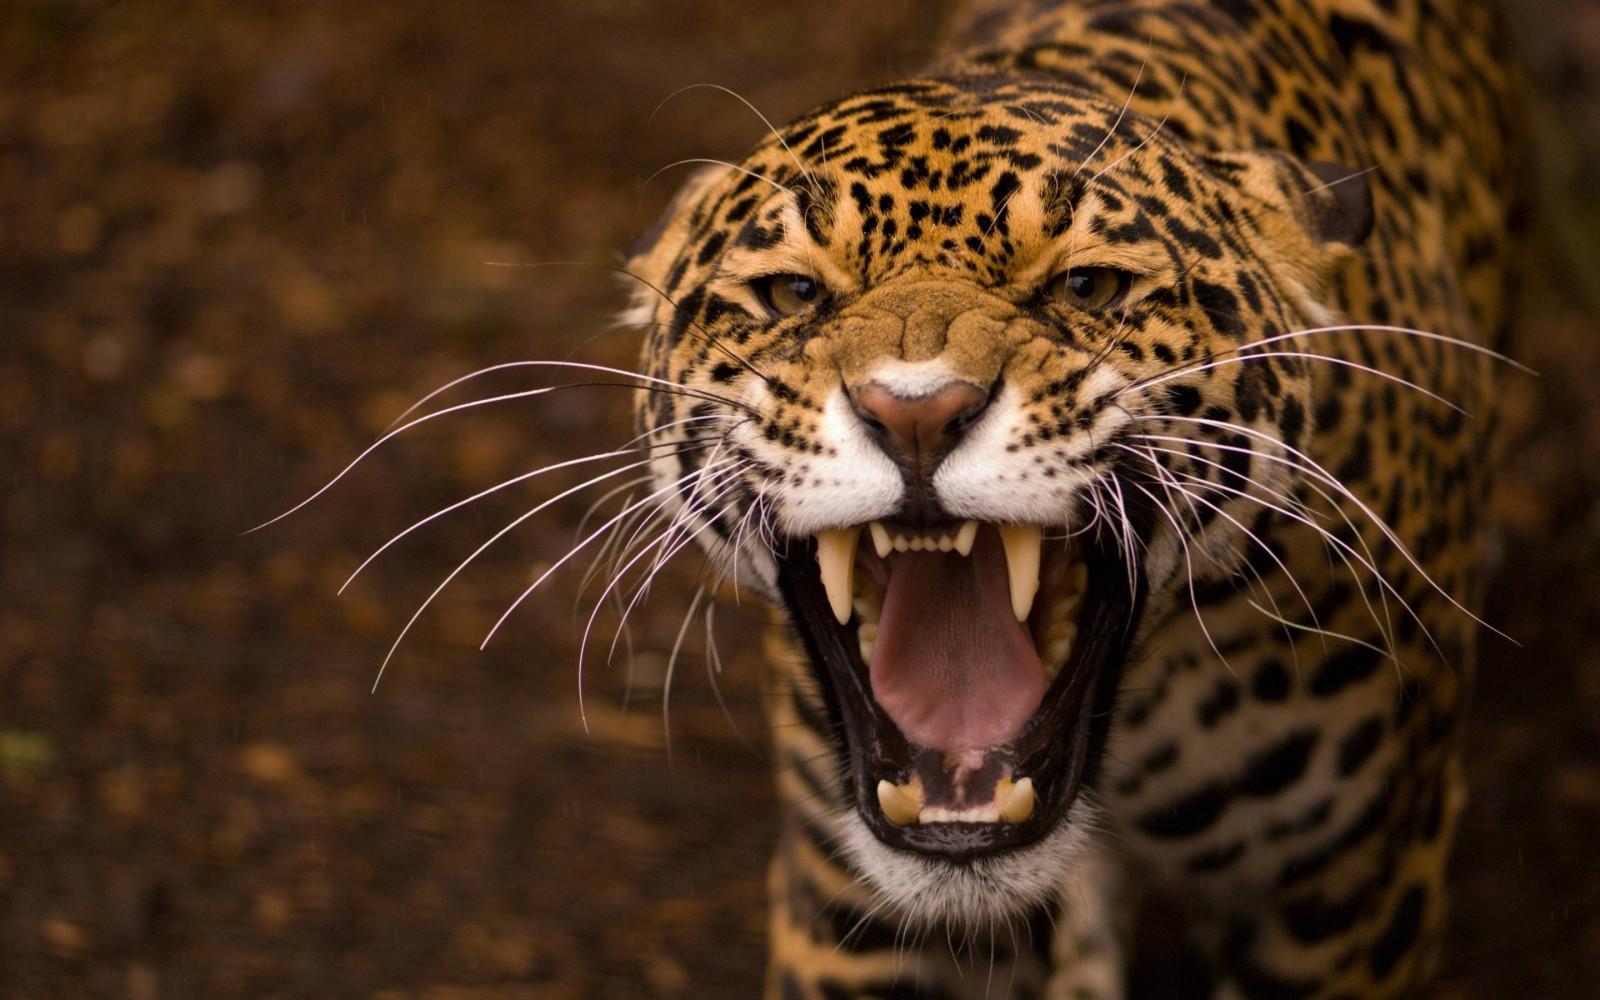 Wallpaper : animals, wildlife, teeth, big cats, whiskers ...